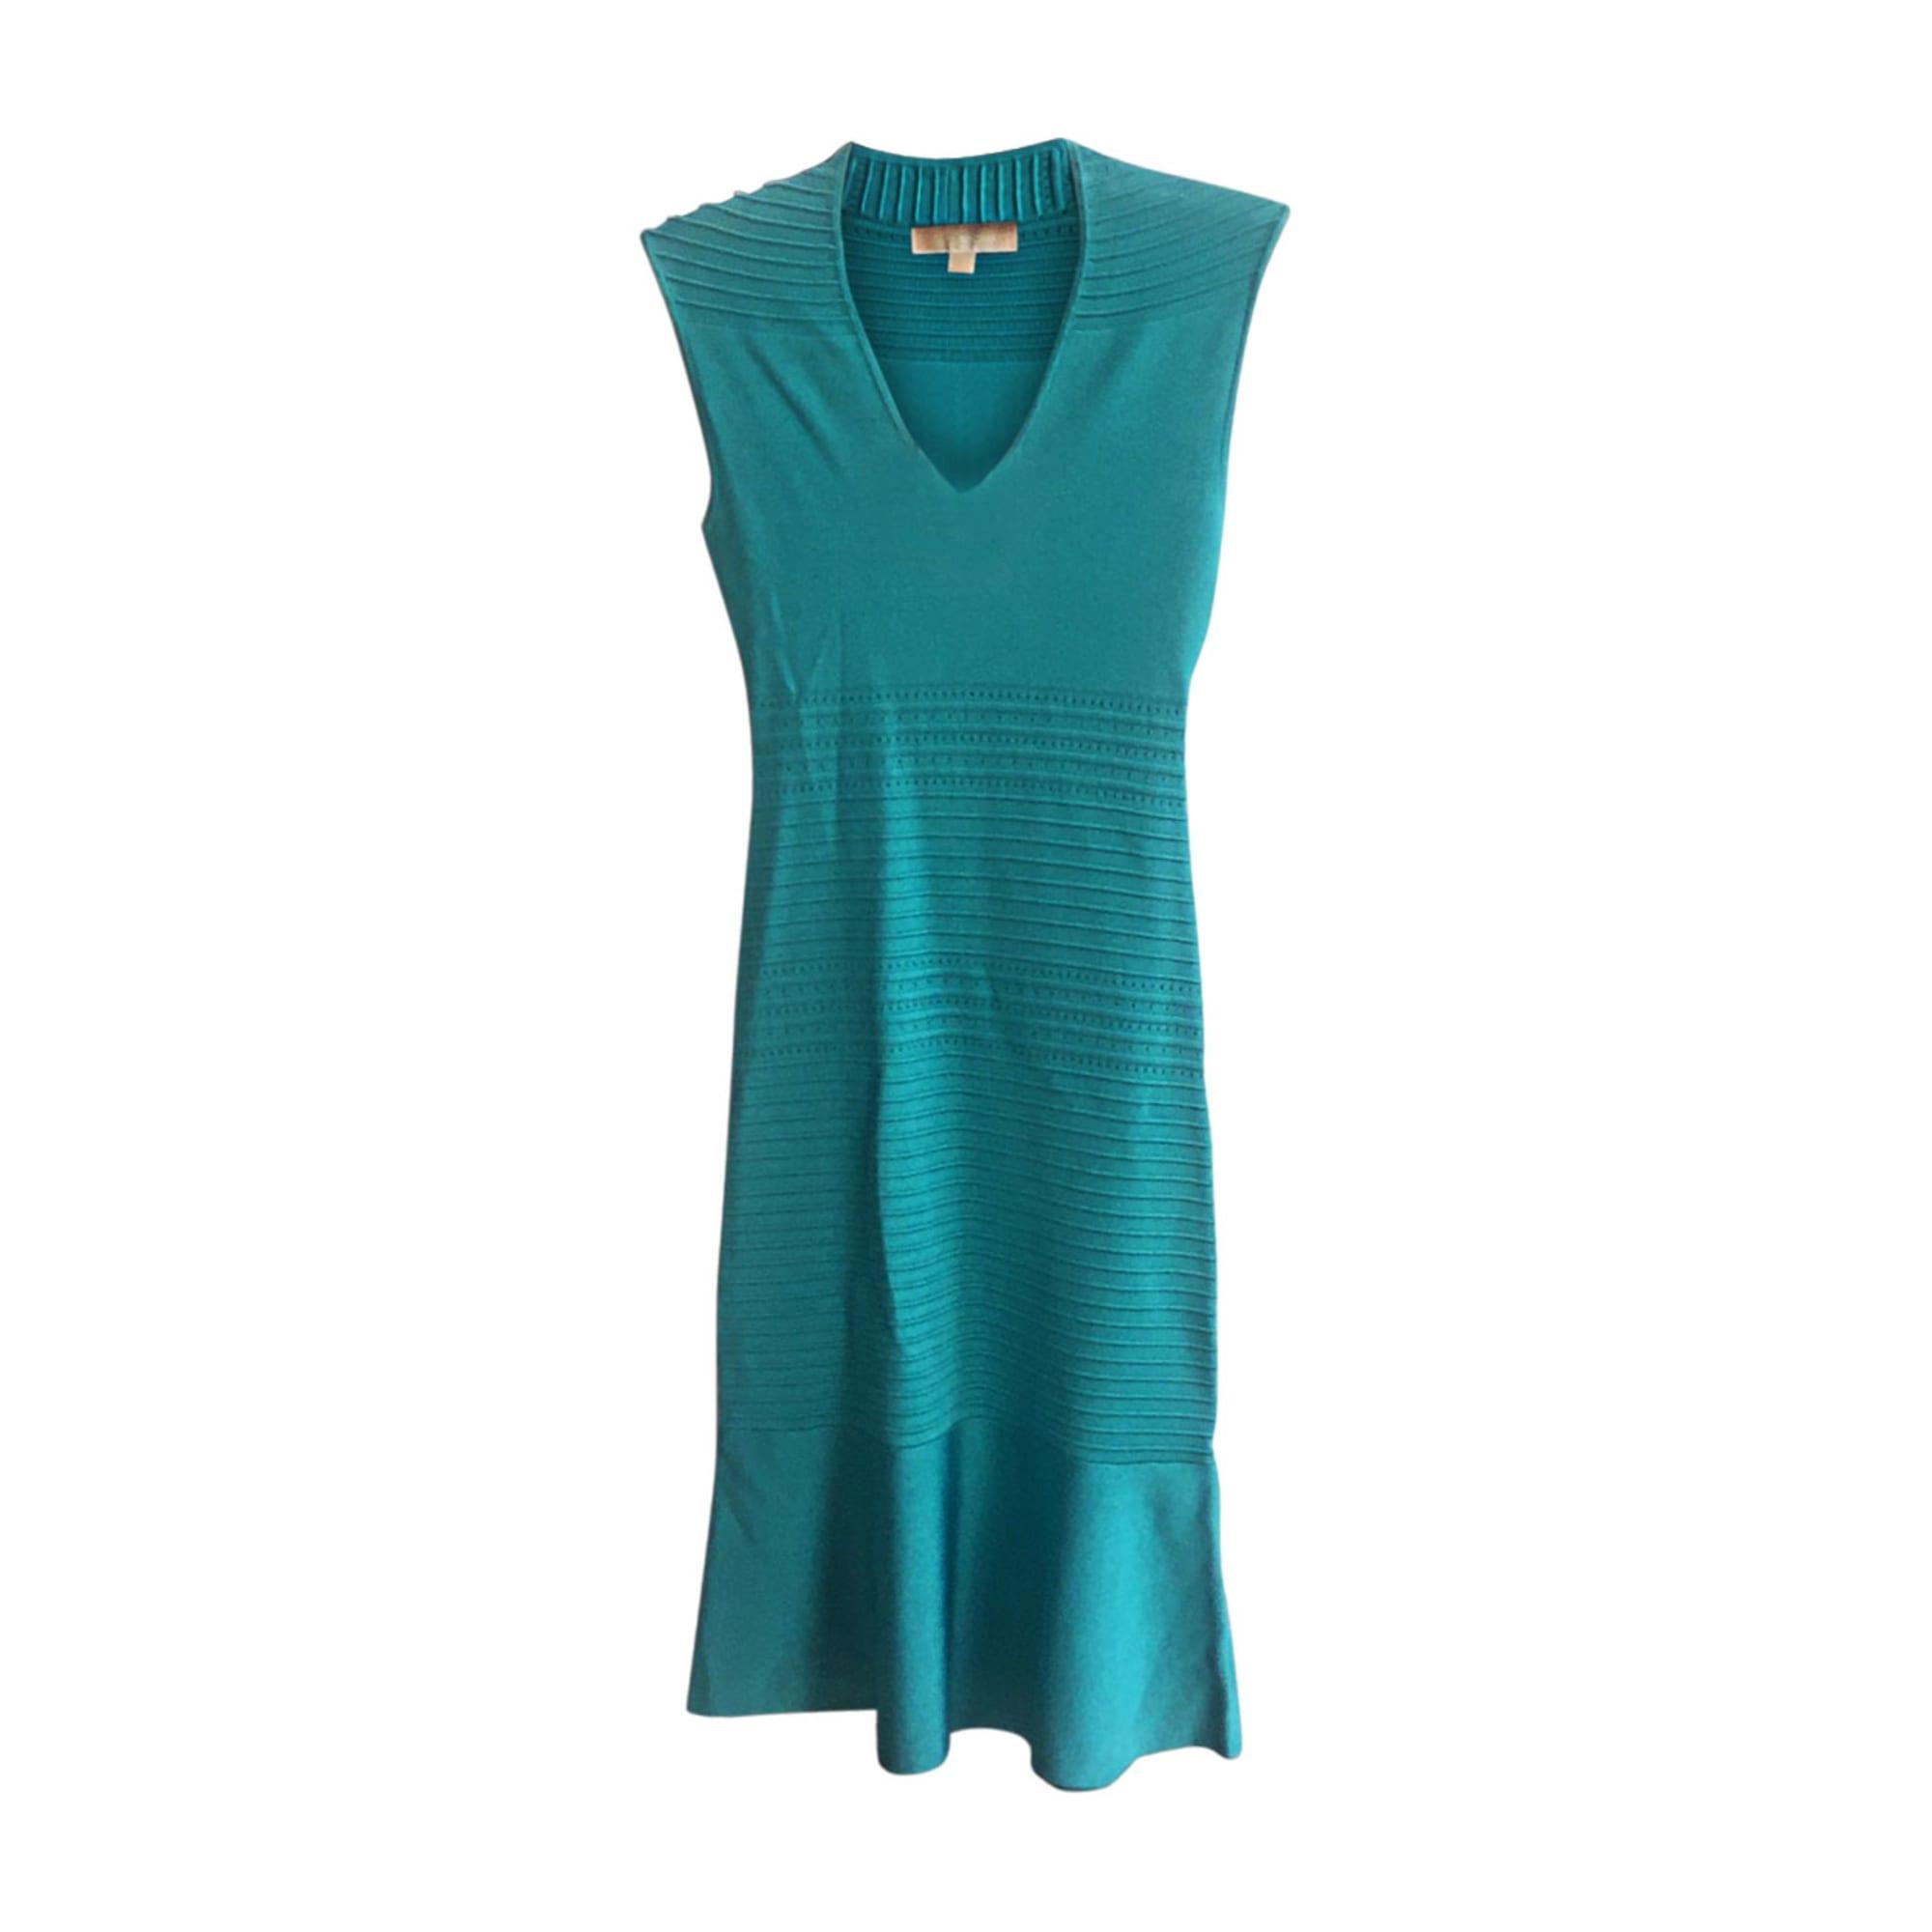 Robe mi-longue MICHAEL KORS Bleu, bleu marine, bleu turquoise